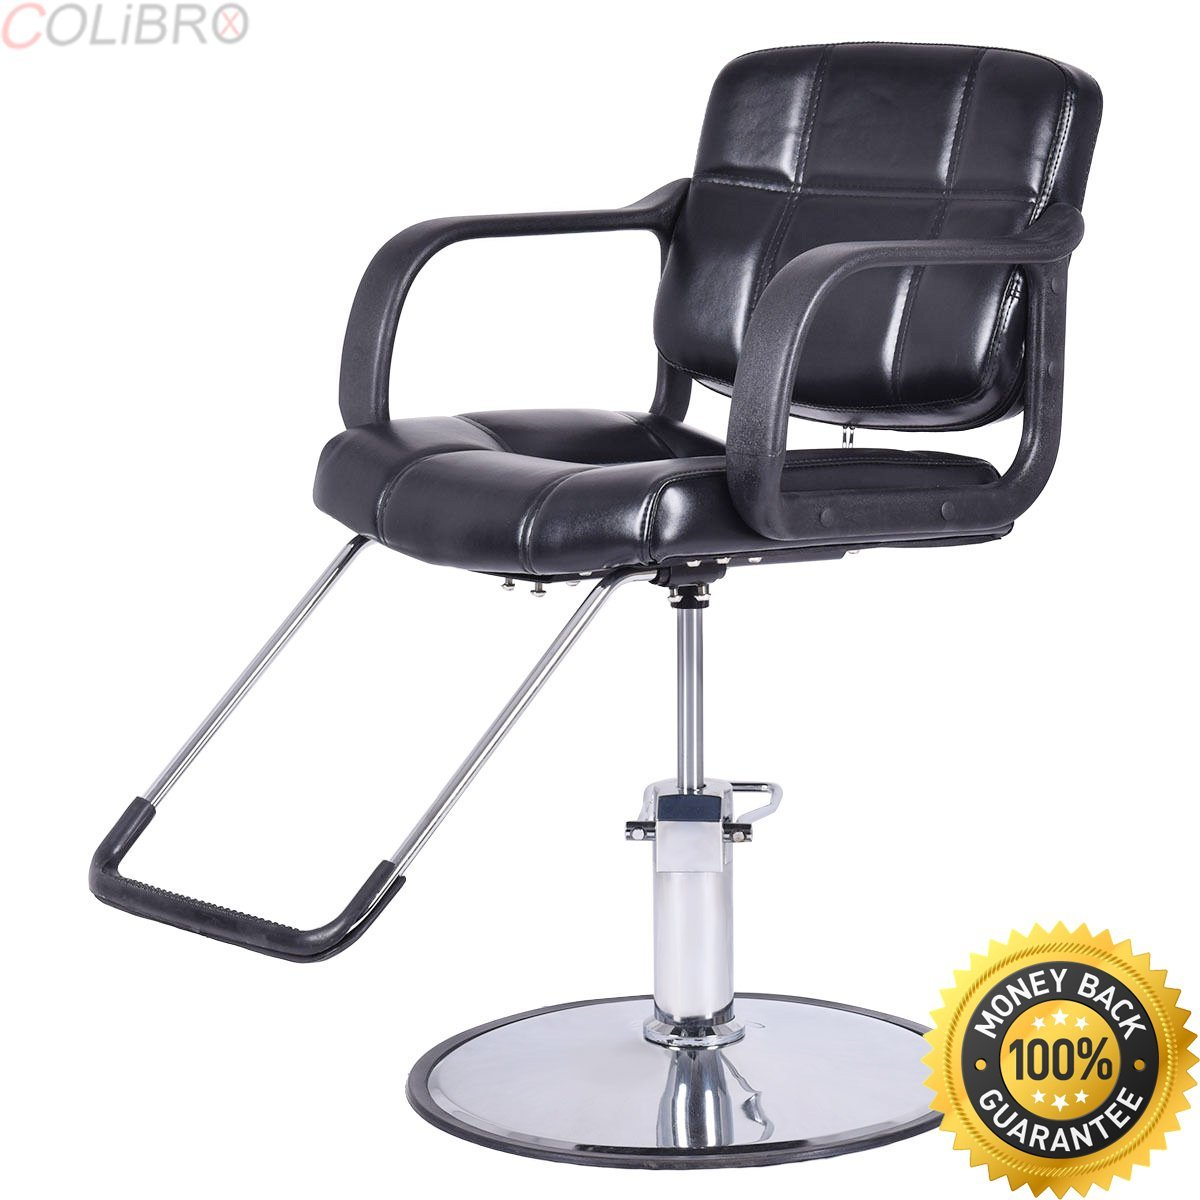 COLIBROX--Classic Hydraulic Barber Chair Salon Beauty Spa Shampoo Hair Styling Shampoo New. shengyu salon chair. heavy duty salon styling chair. plus size salon chairs. salon chairs for tall stylists.